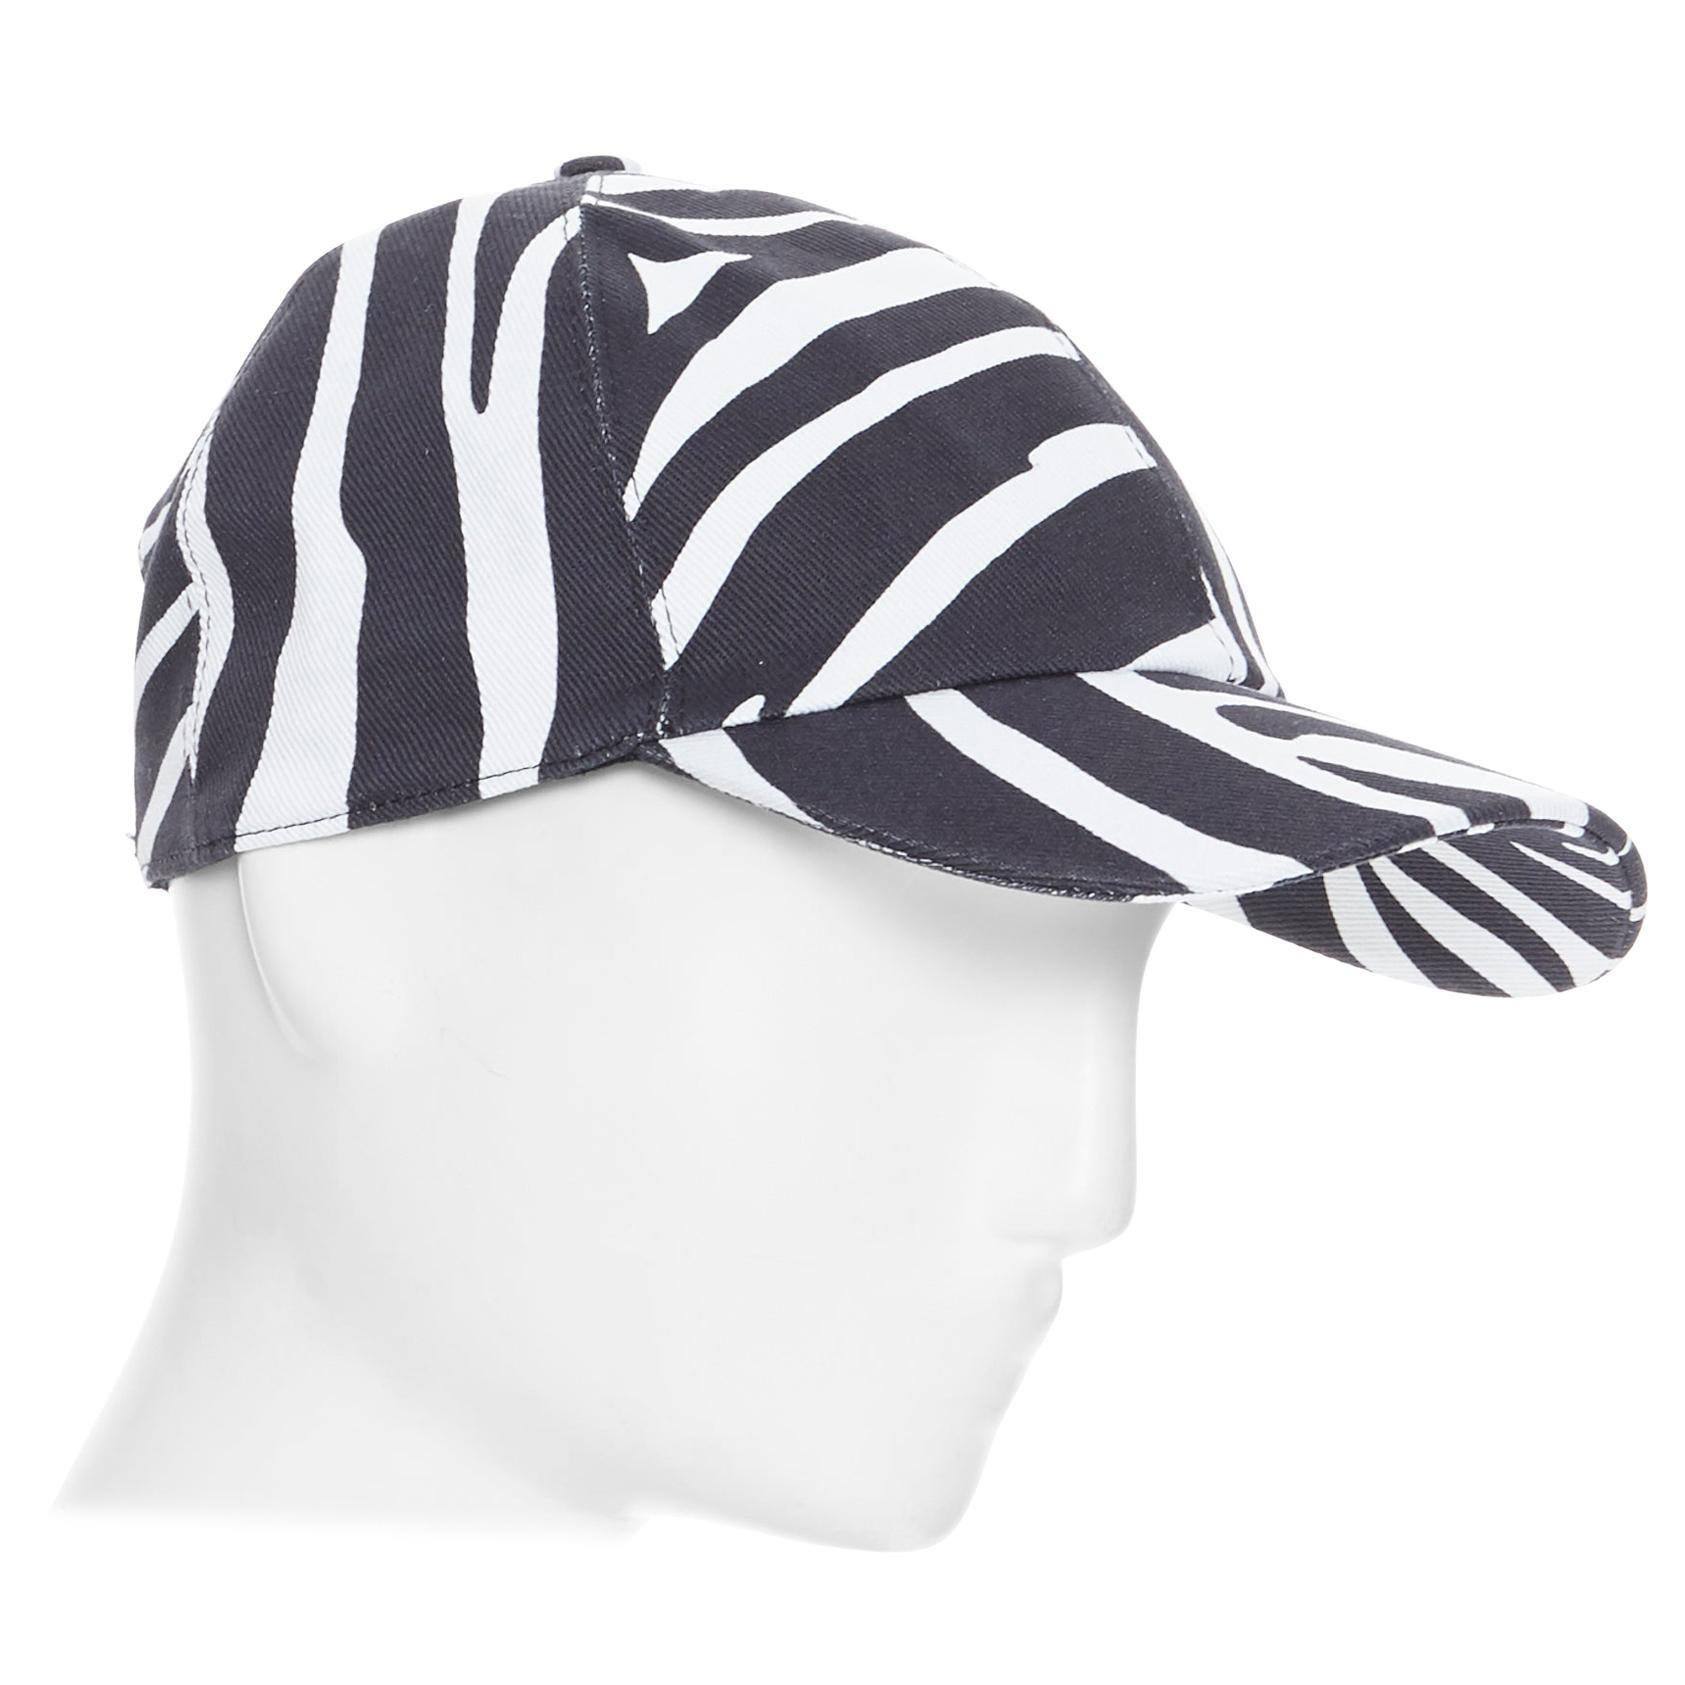 new VERSACE 2019 black white zebra srtipe cotton gold Medusa buckle cap hat 57